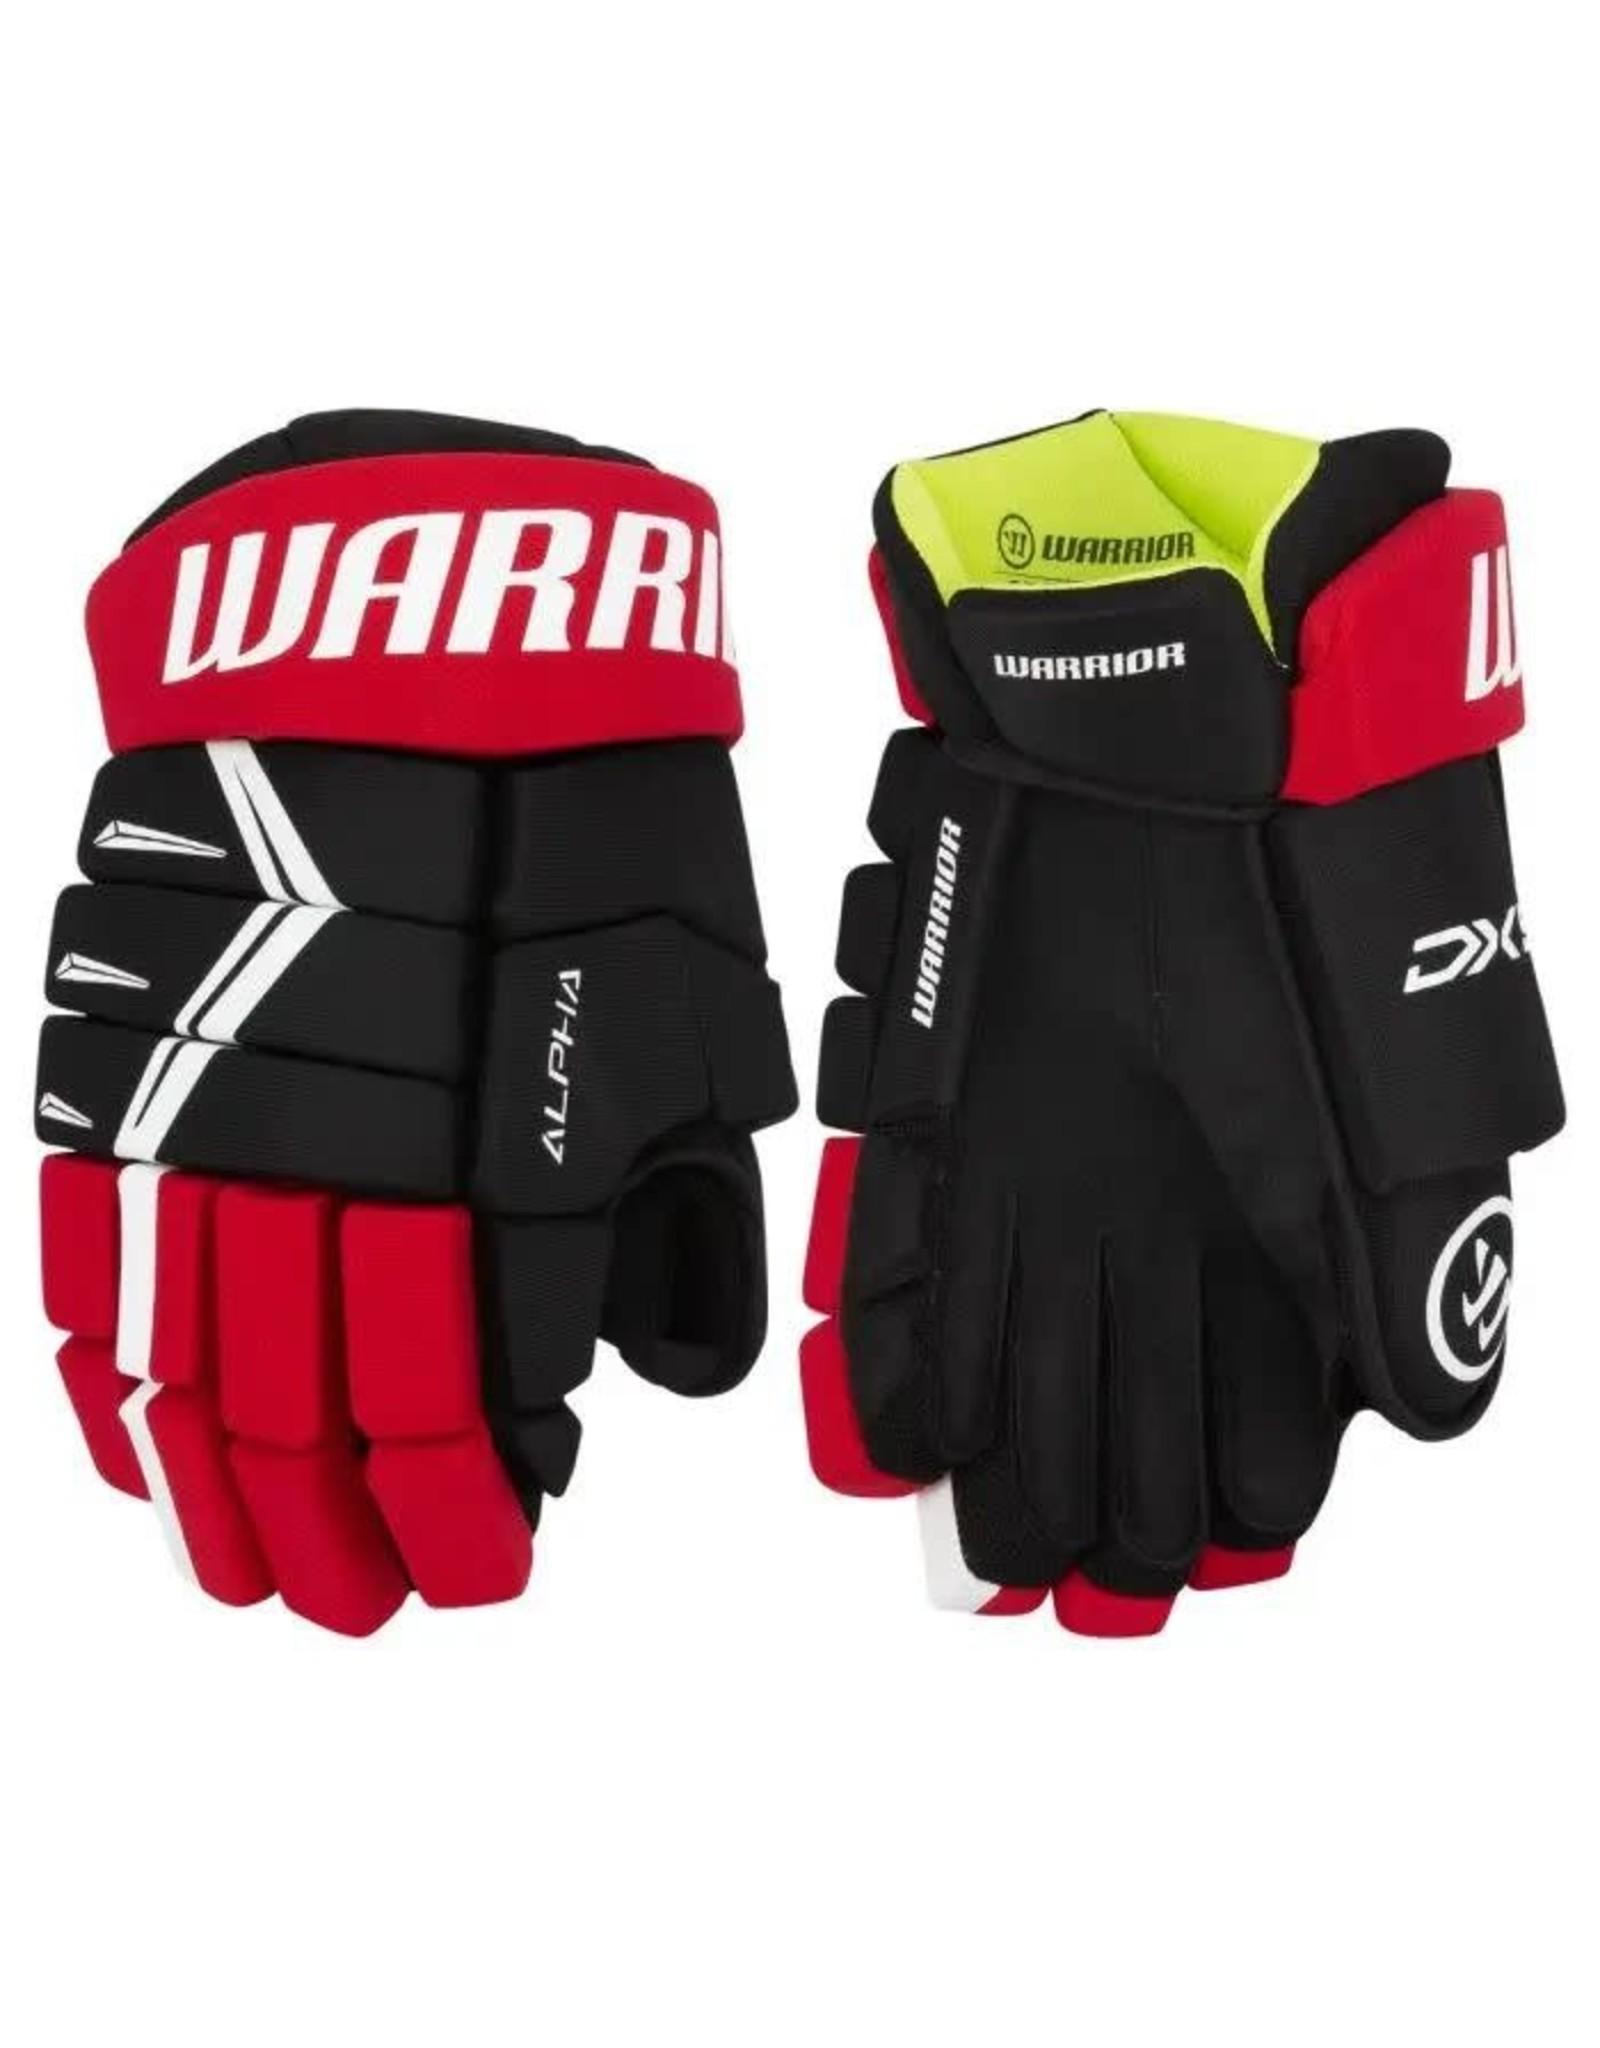 WARRIOR Alpha DX5, Senior, Hockey Gloves